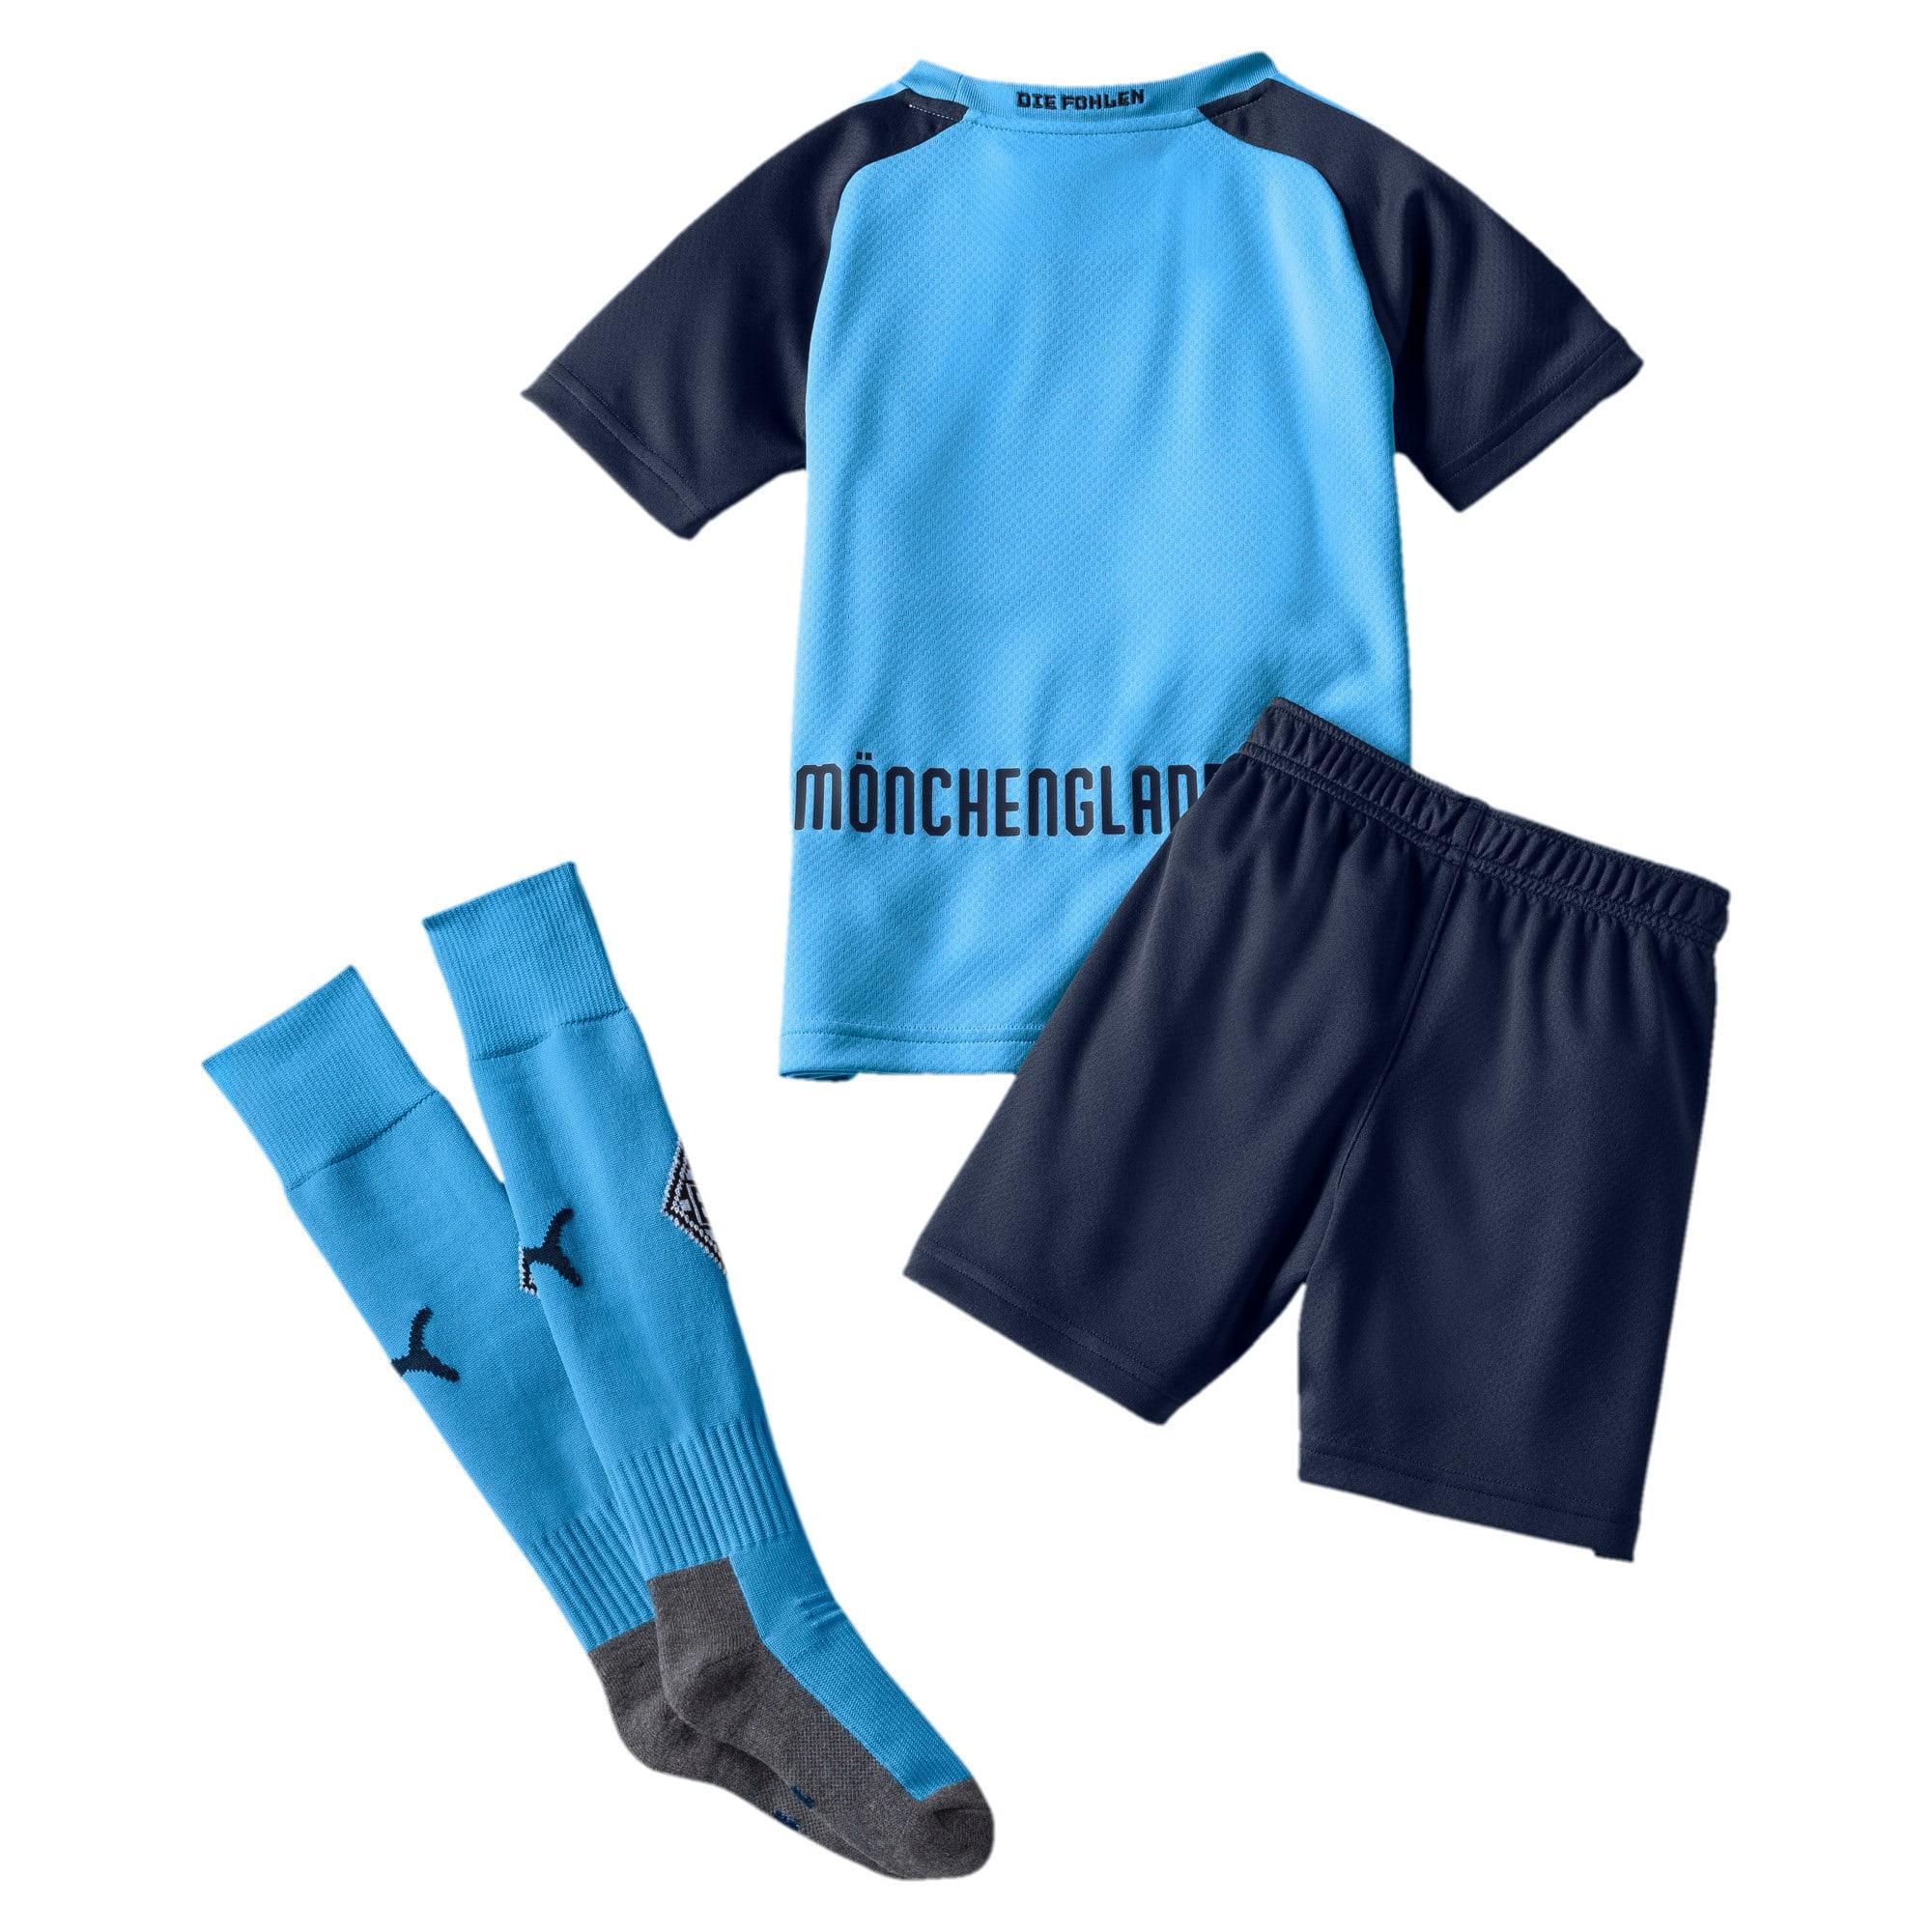 Thumbnail 2 of Borussia Mönchengladbach Kinder Auswärts Mini Set, Team Light Blue-Peacoat, medium